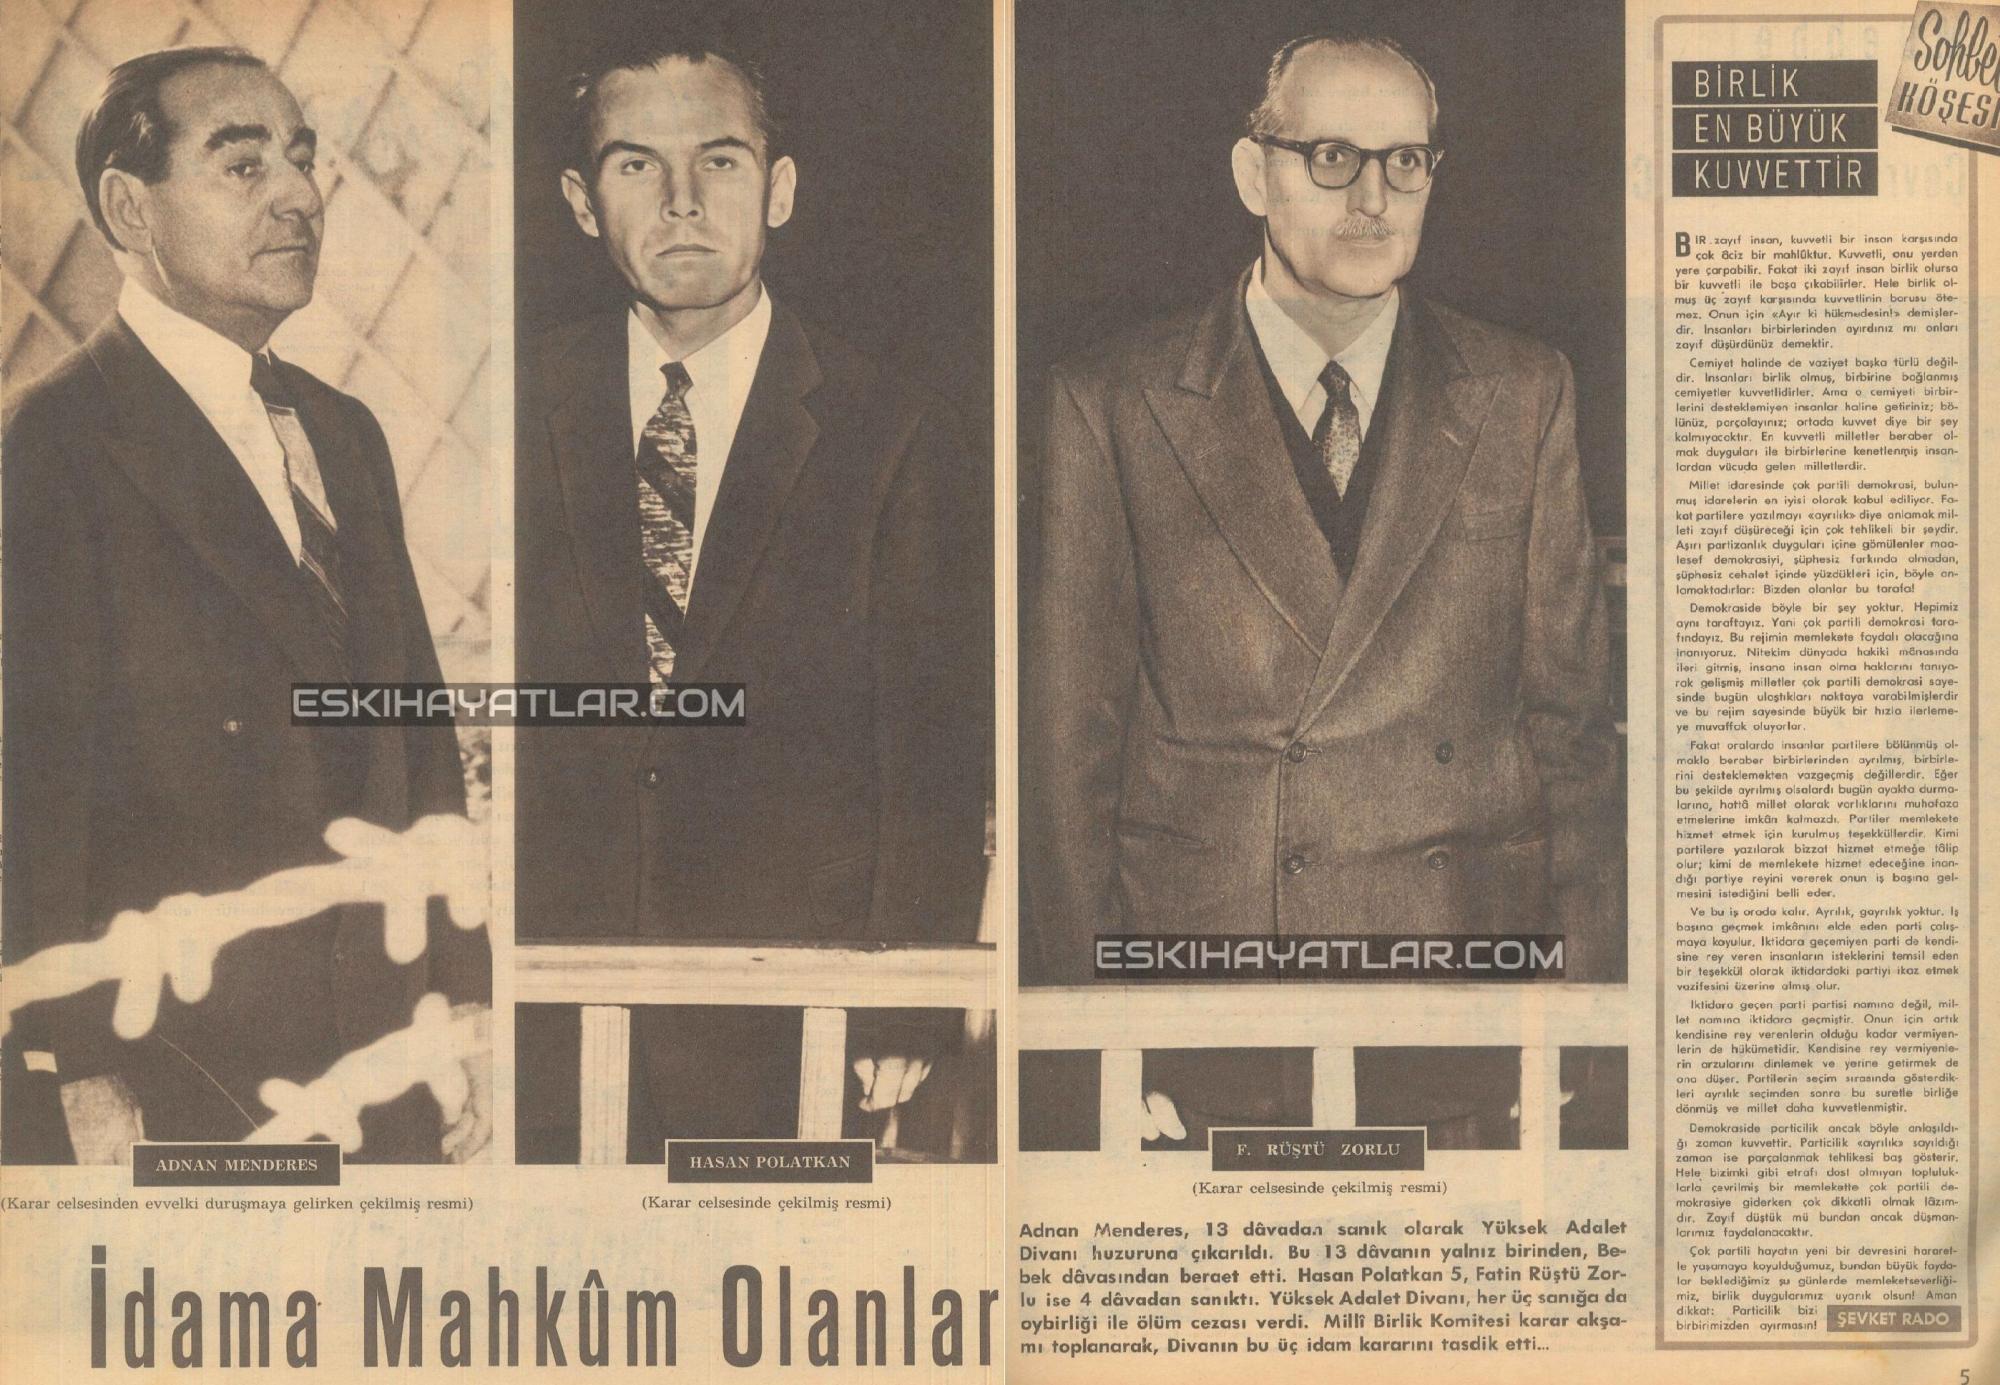 1960-ihtilali-idam-edilenler-adnan-menderes-hasan-polatkan-fatin-rustu-zorlu-yassiada-tutanaklari-1961-hayat-dergisi-arsivleri (4)